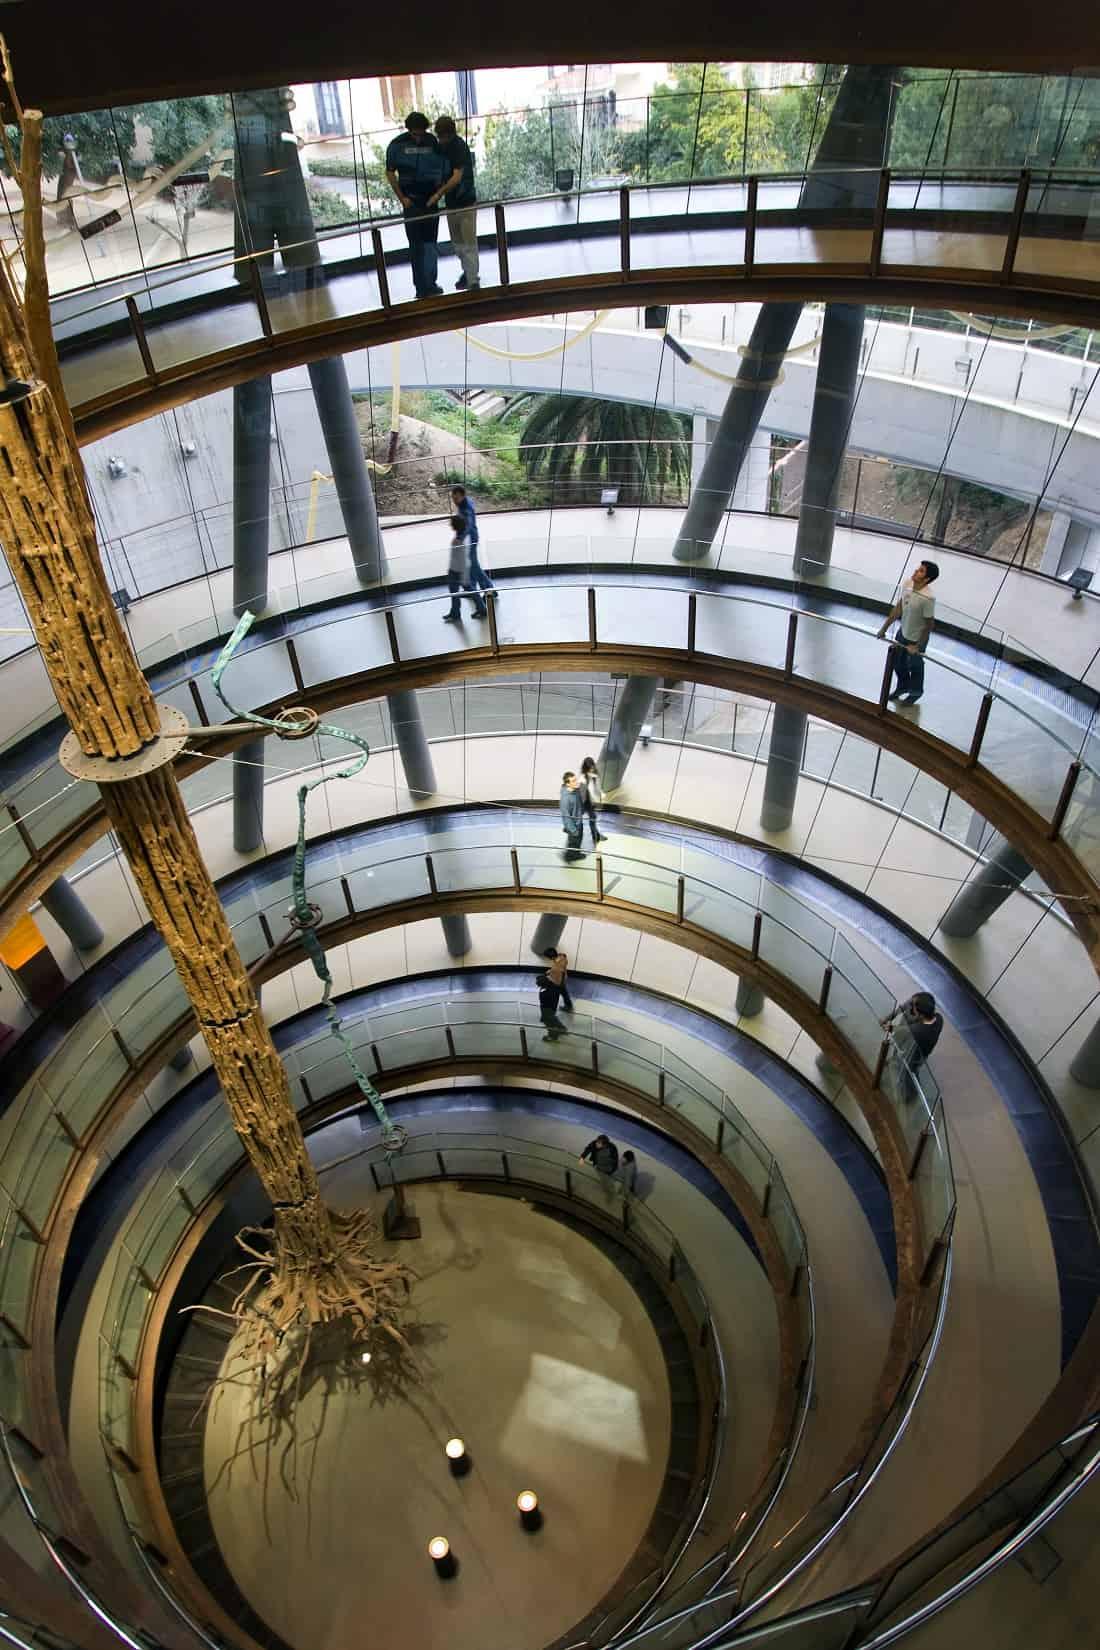 Free Museum Days in Barcelona - Barcelona Navigator